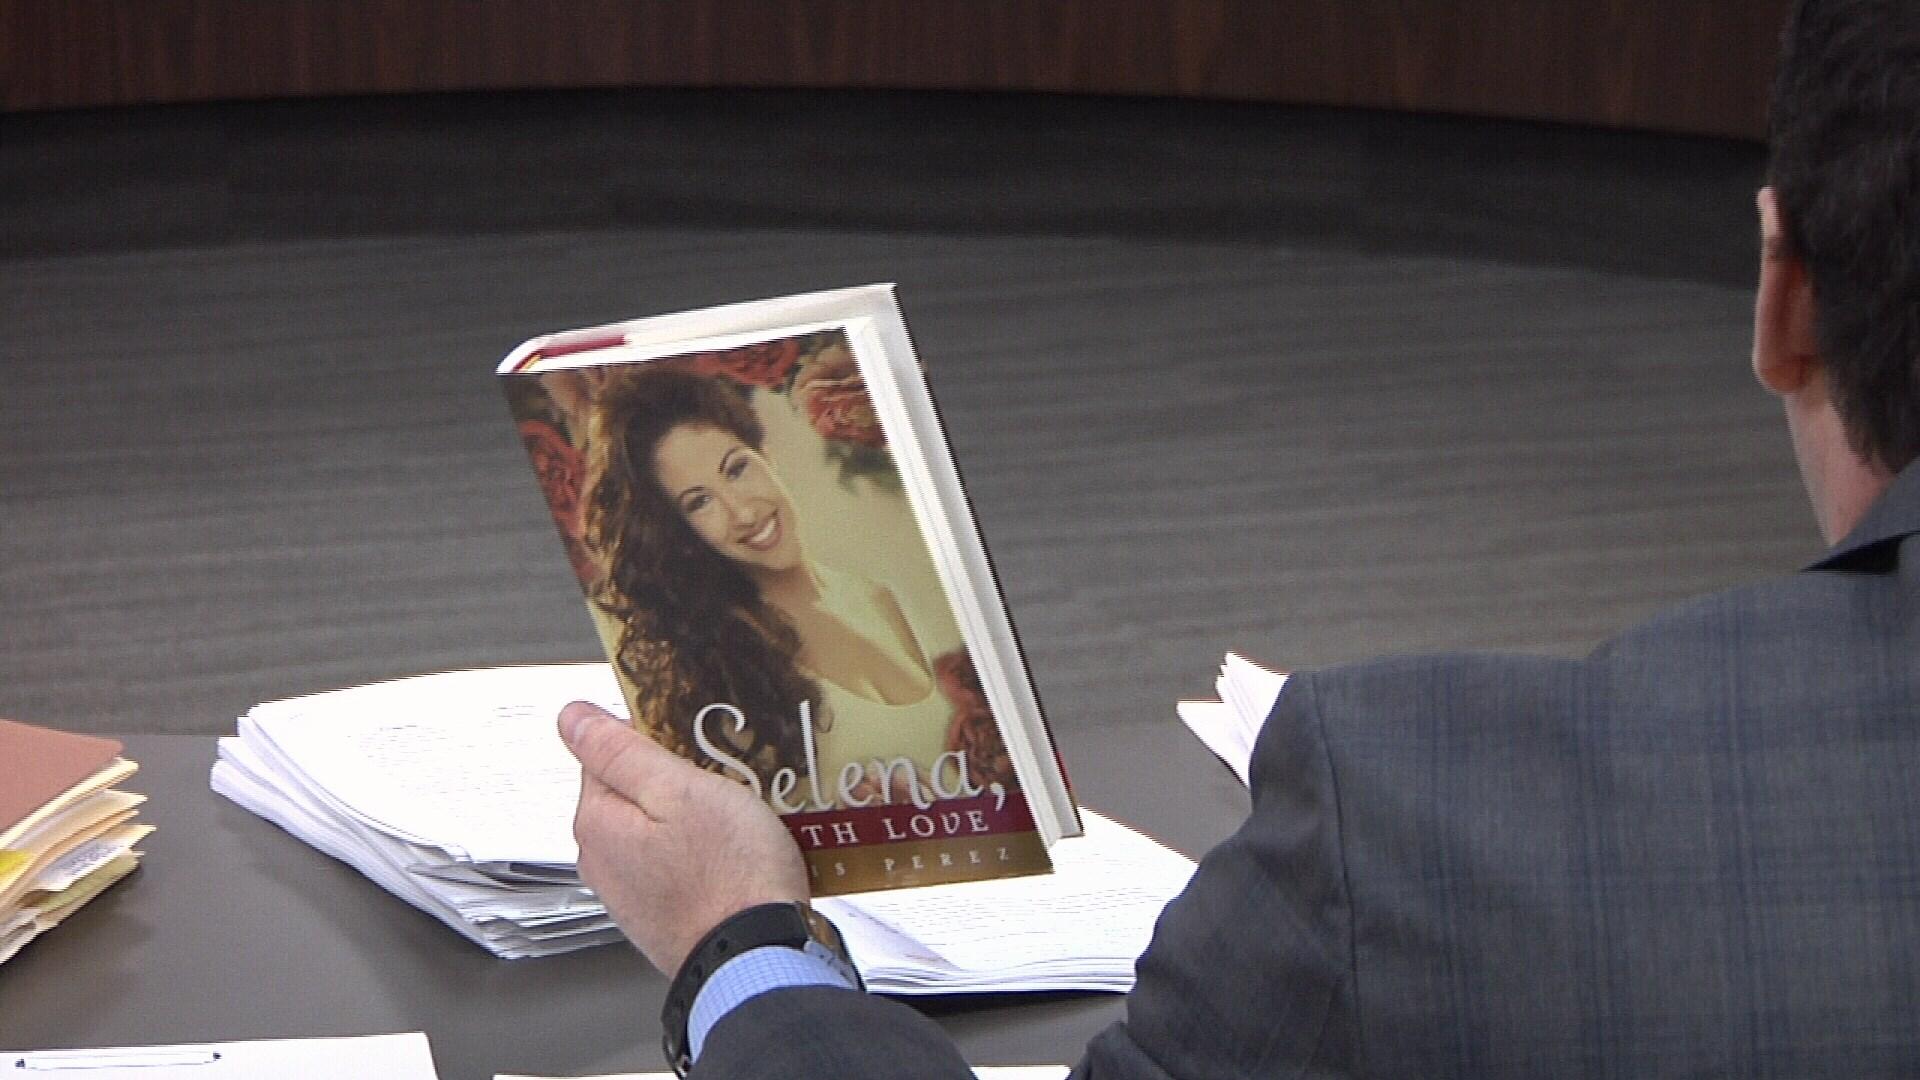 Selena lawsuit moving forward - KZTV10.com   Continuous News Coverage   Corpus Christi